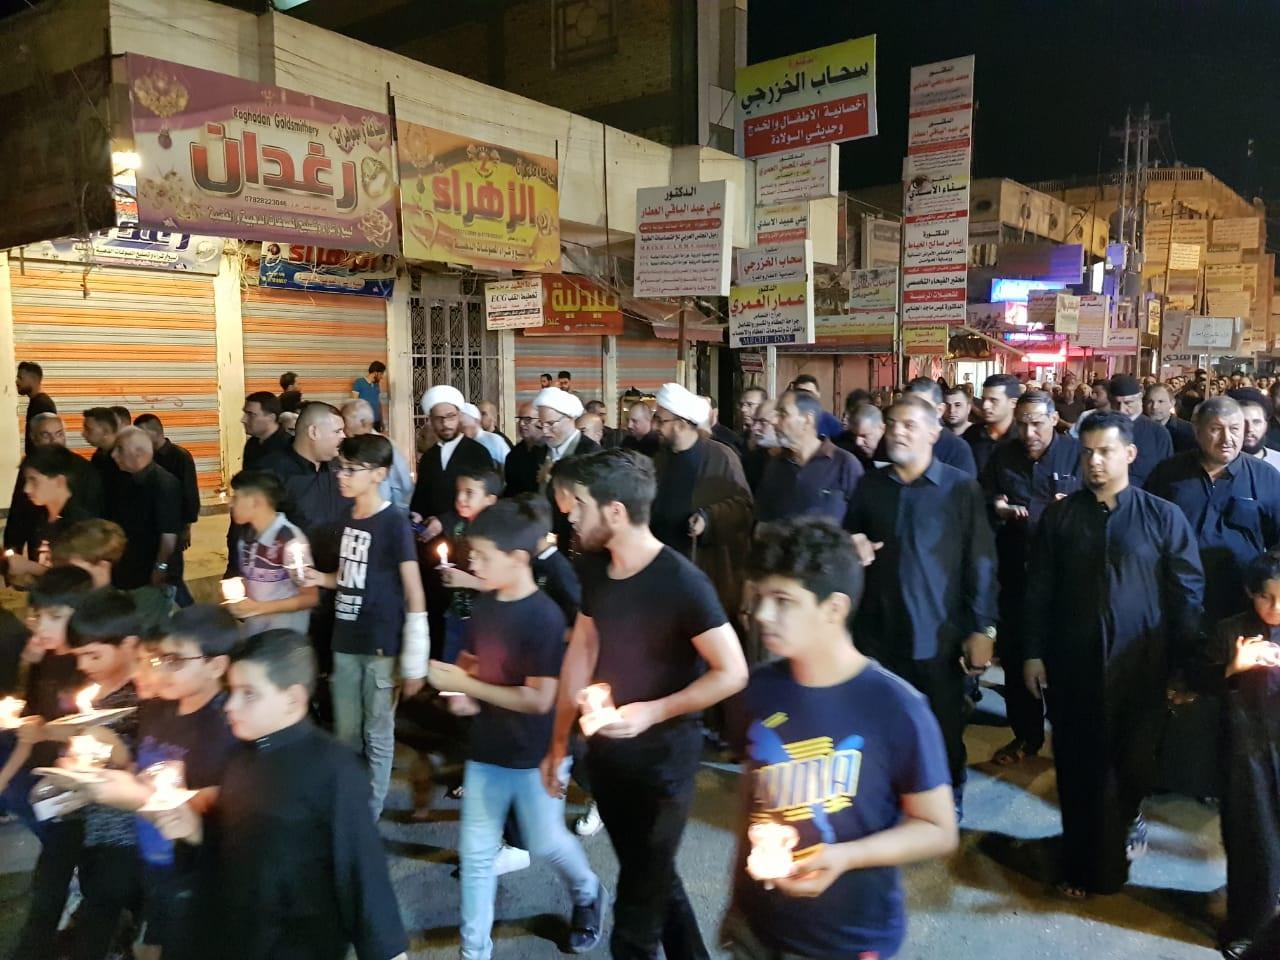 www.nasiriyah.org/ara/sites/default/files/photo-2018-09-20-19-36-32_1_0